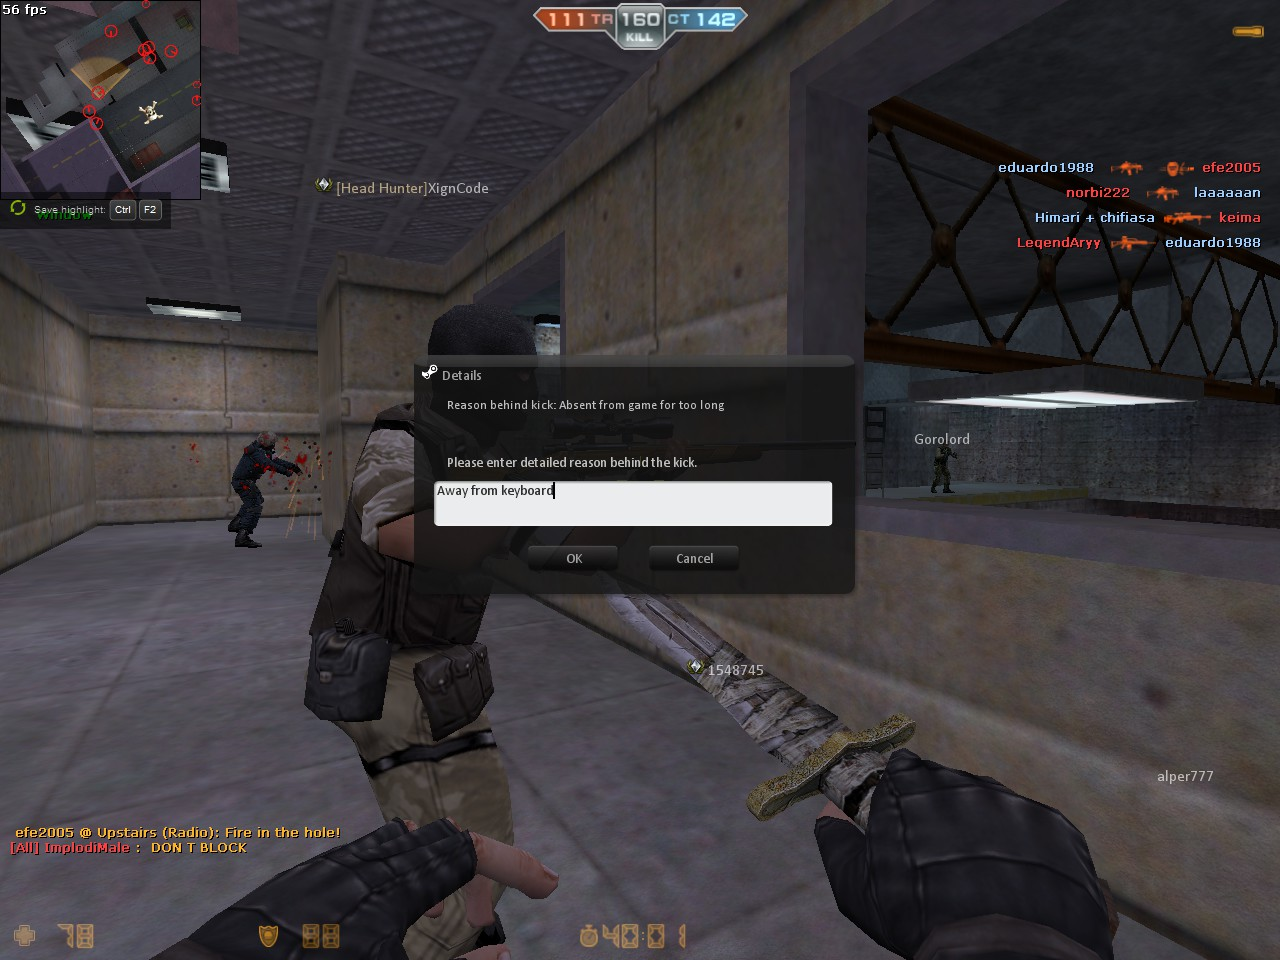 console command to kick yourself csgo